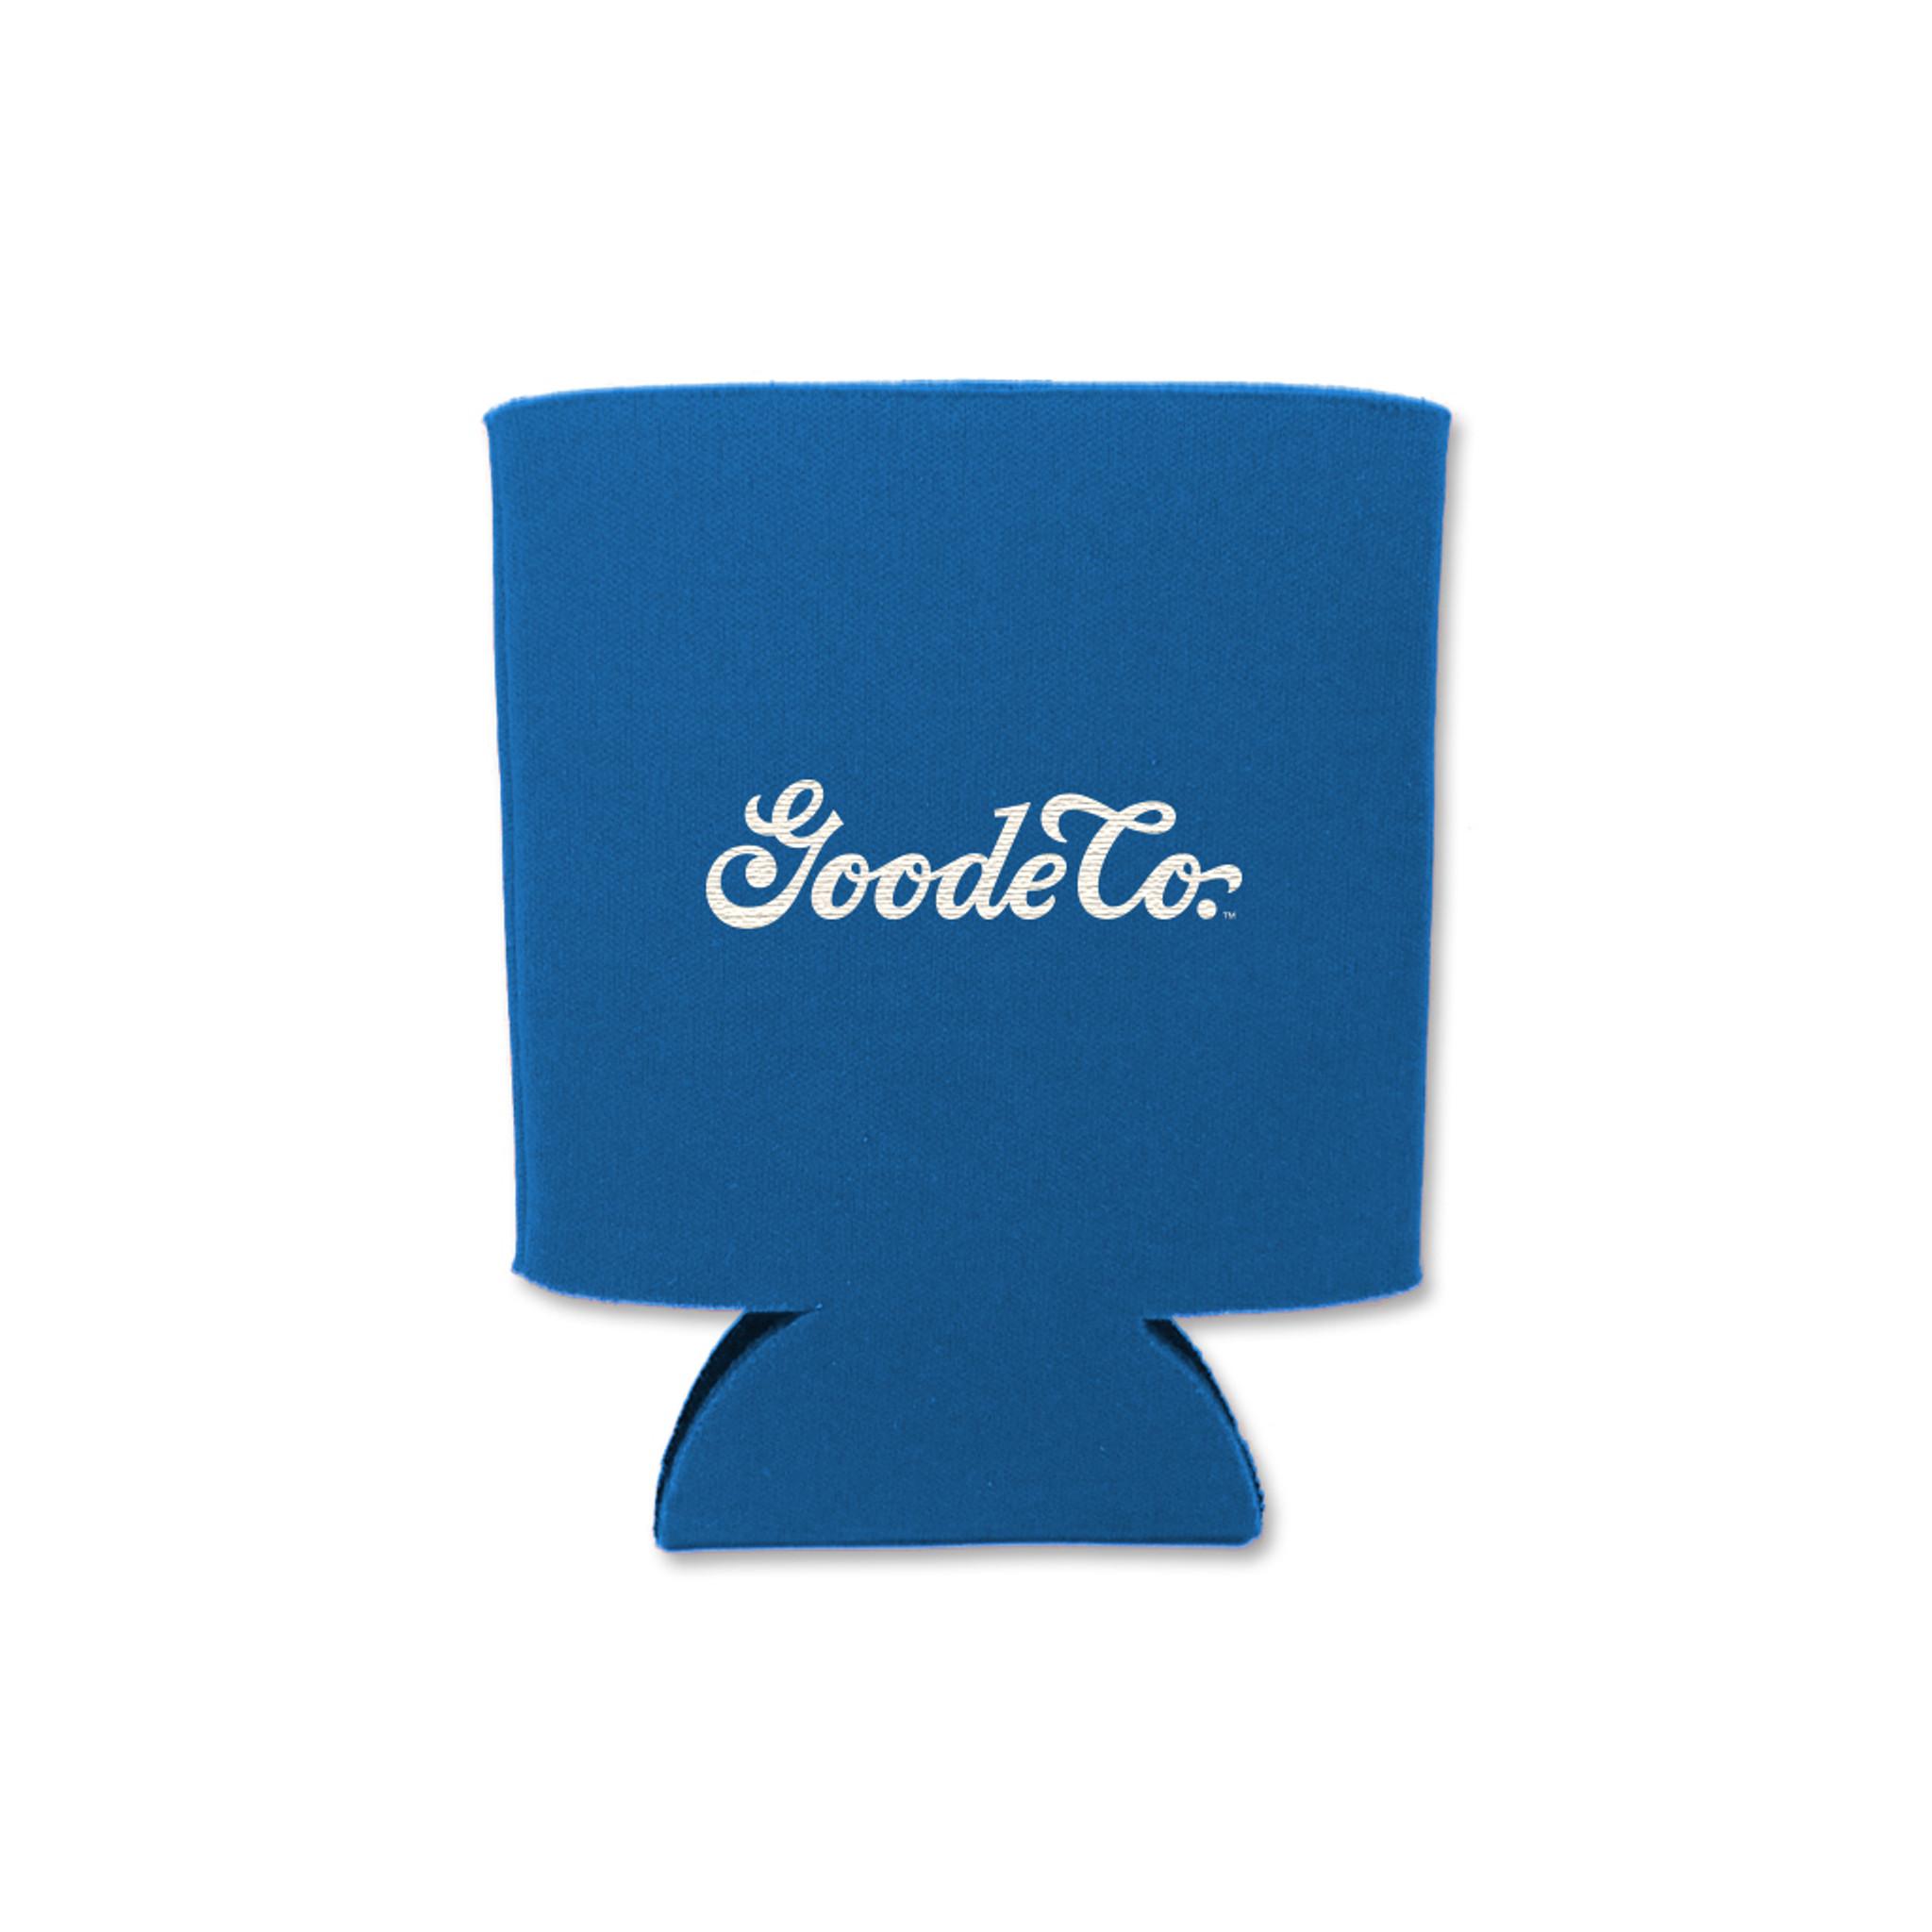 Back of Goode Co's blue El Guapo koozie.